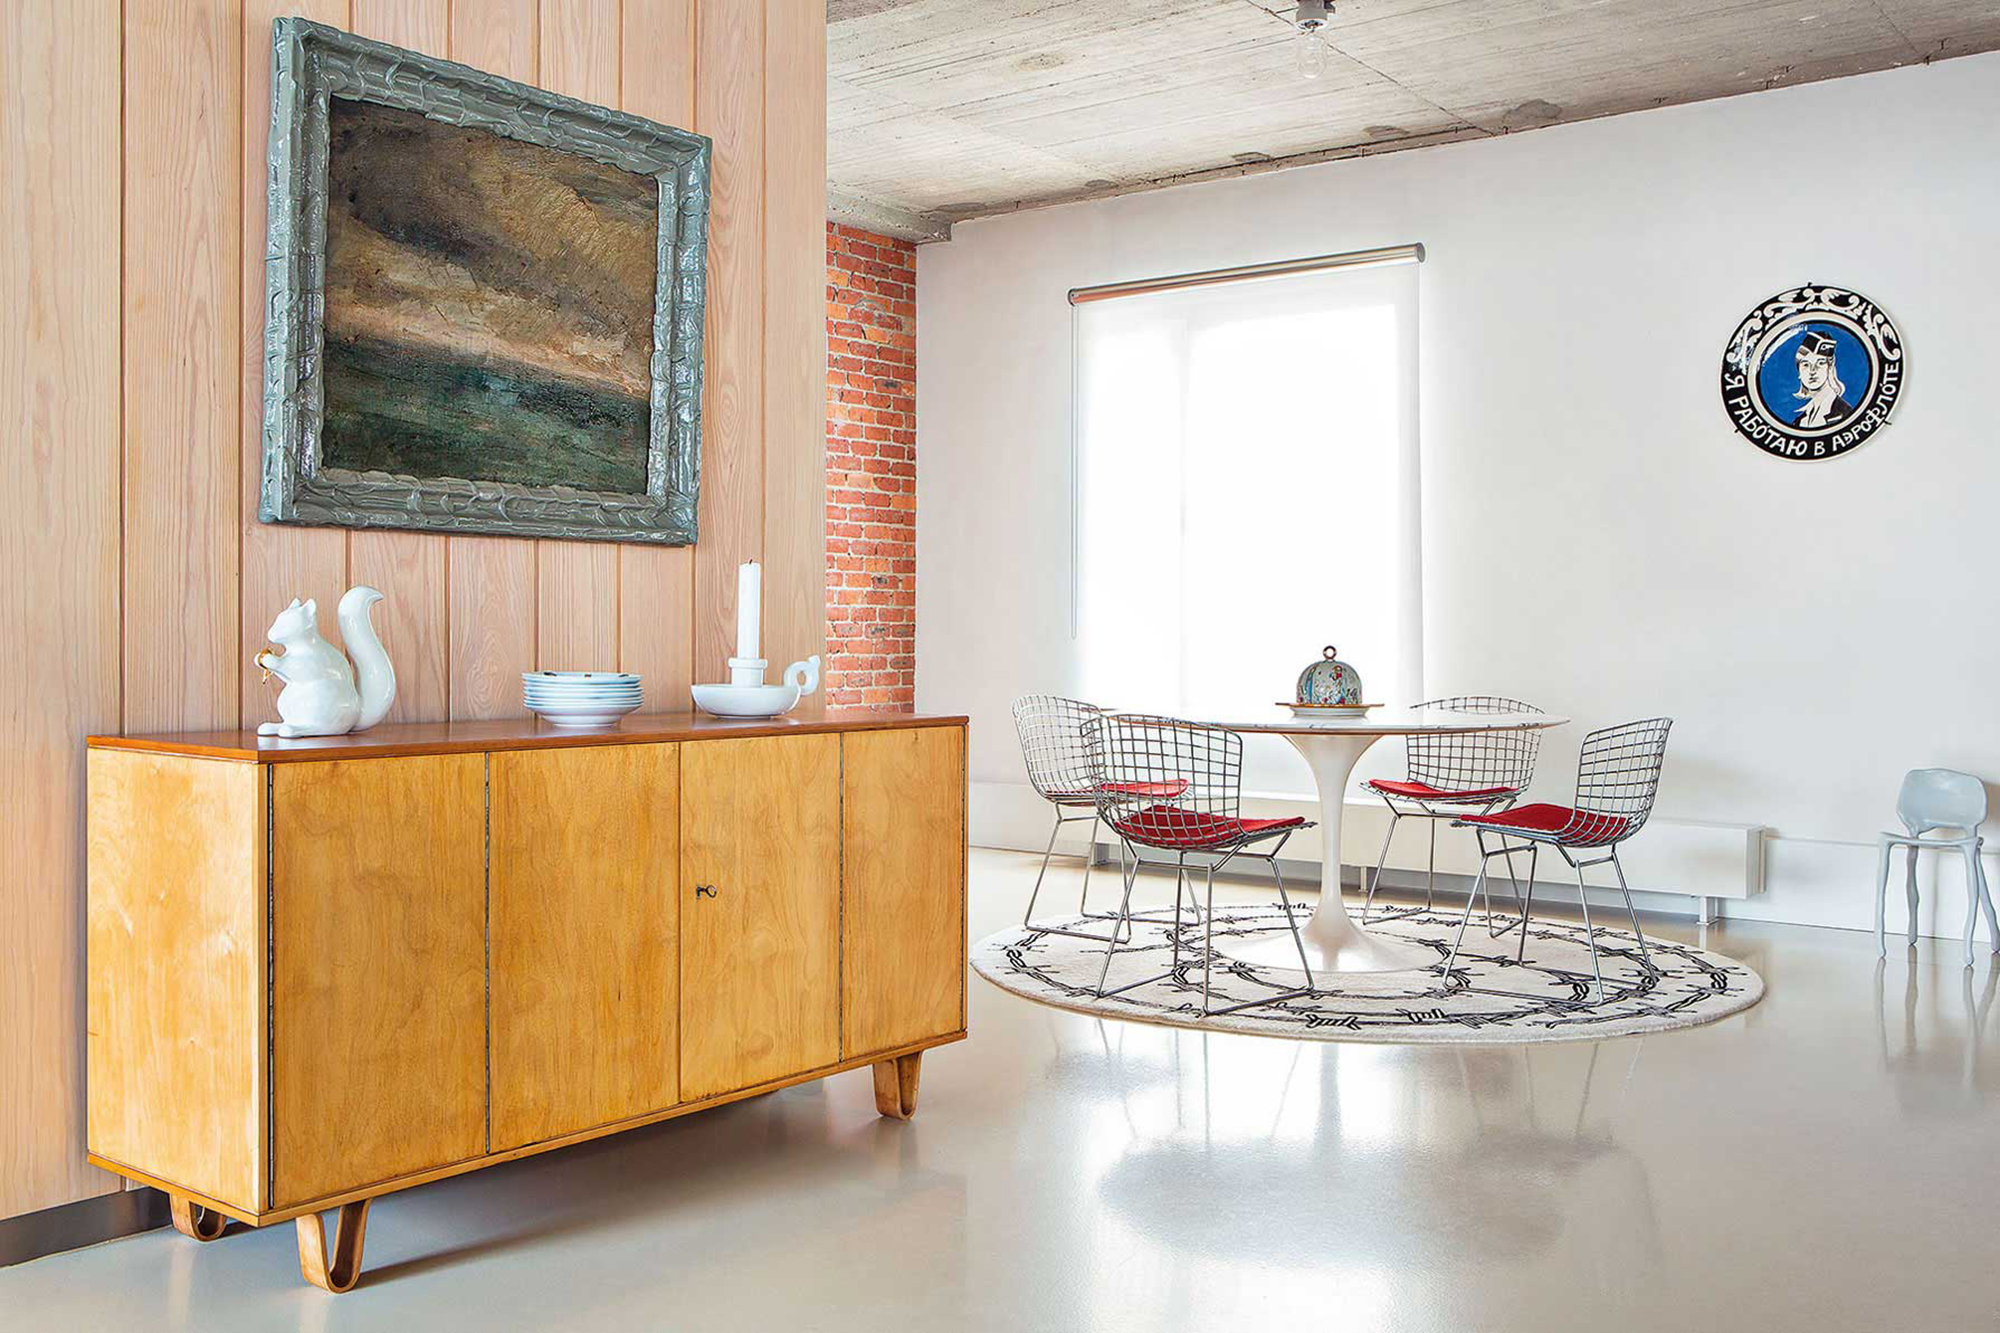 Studio Job 1st floor kitchen photo Ricardo Labougle